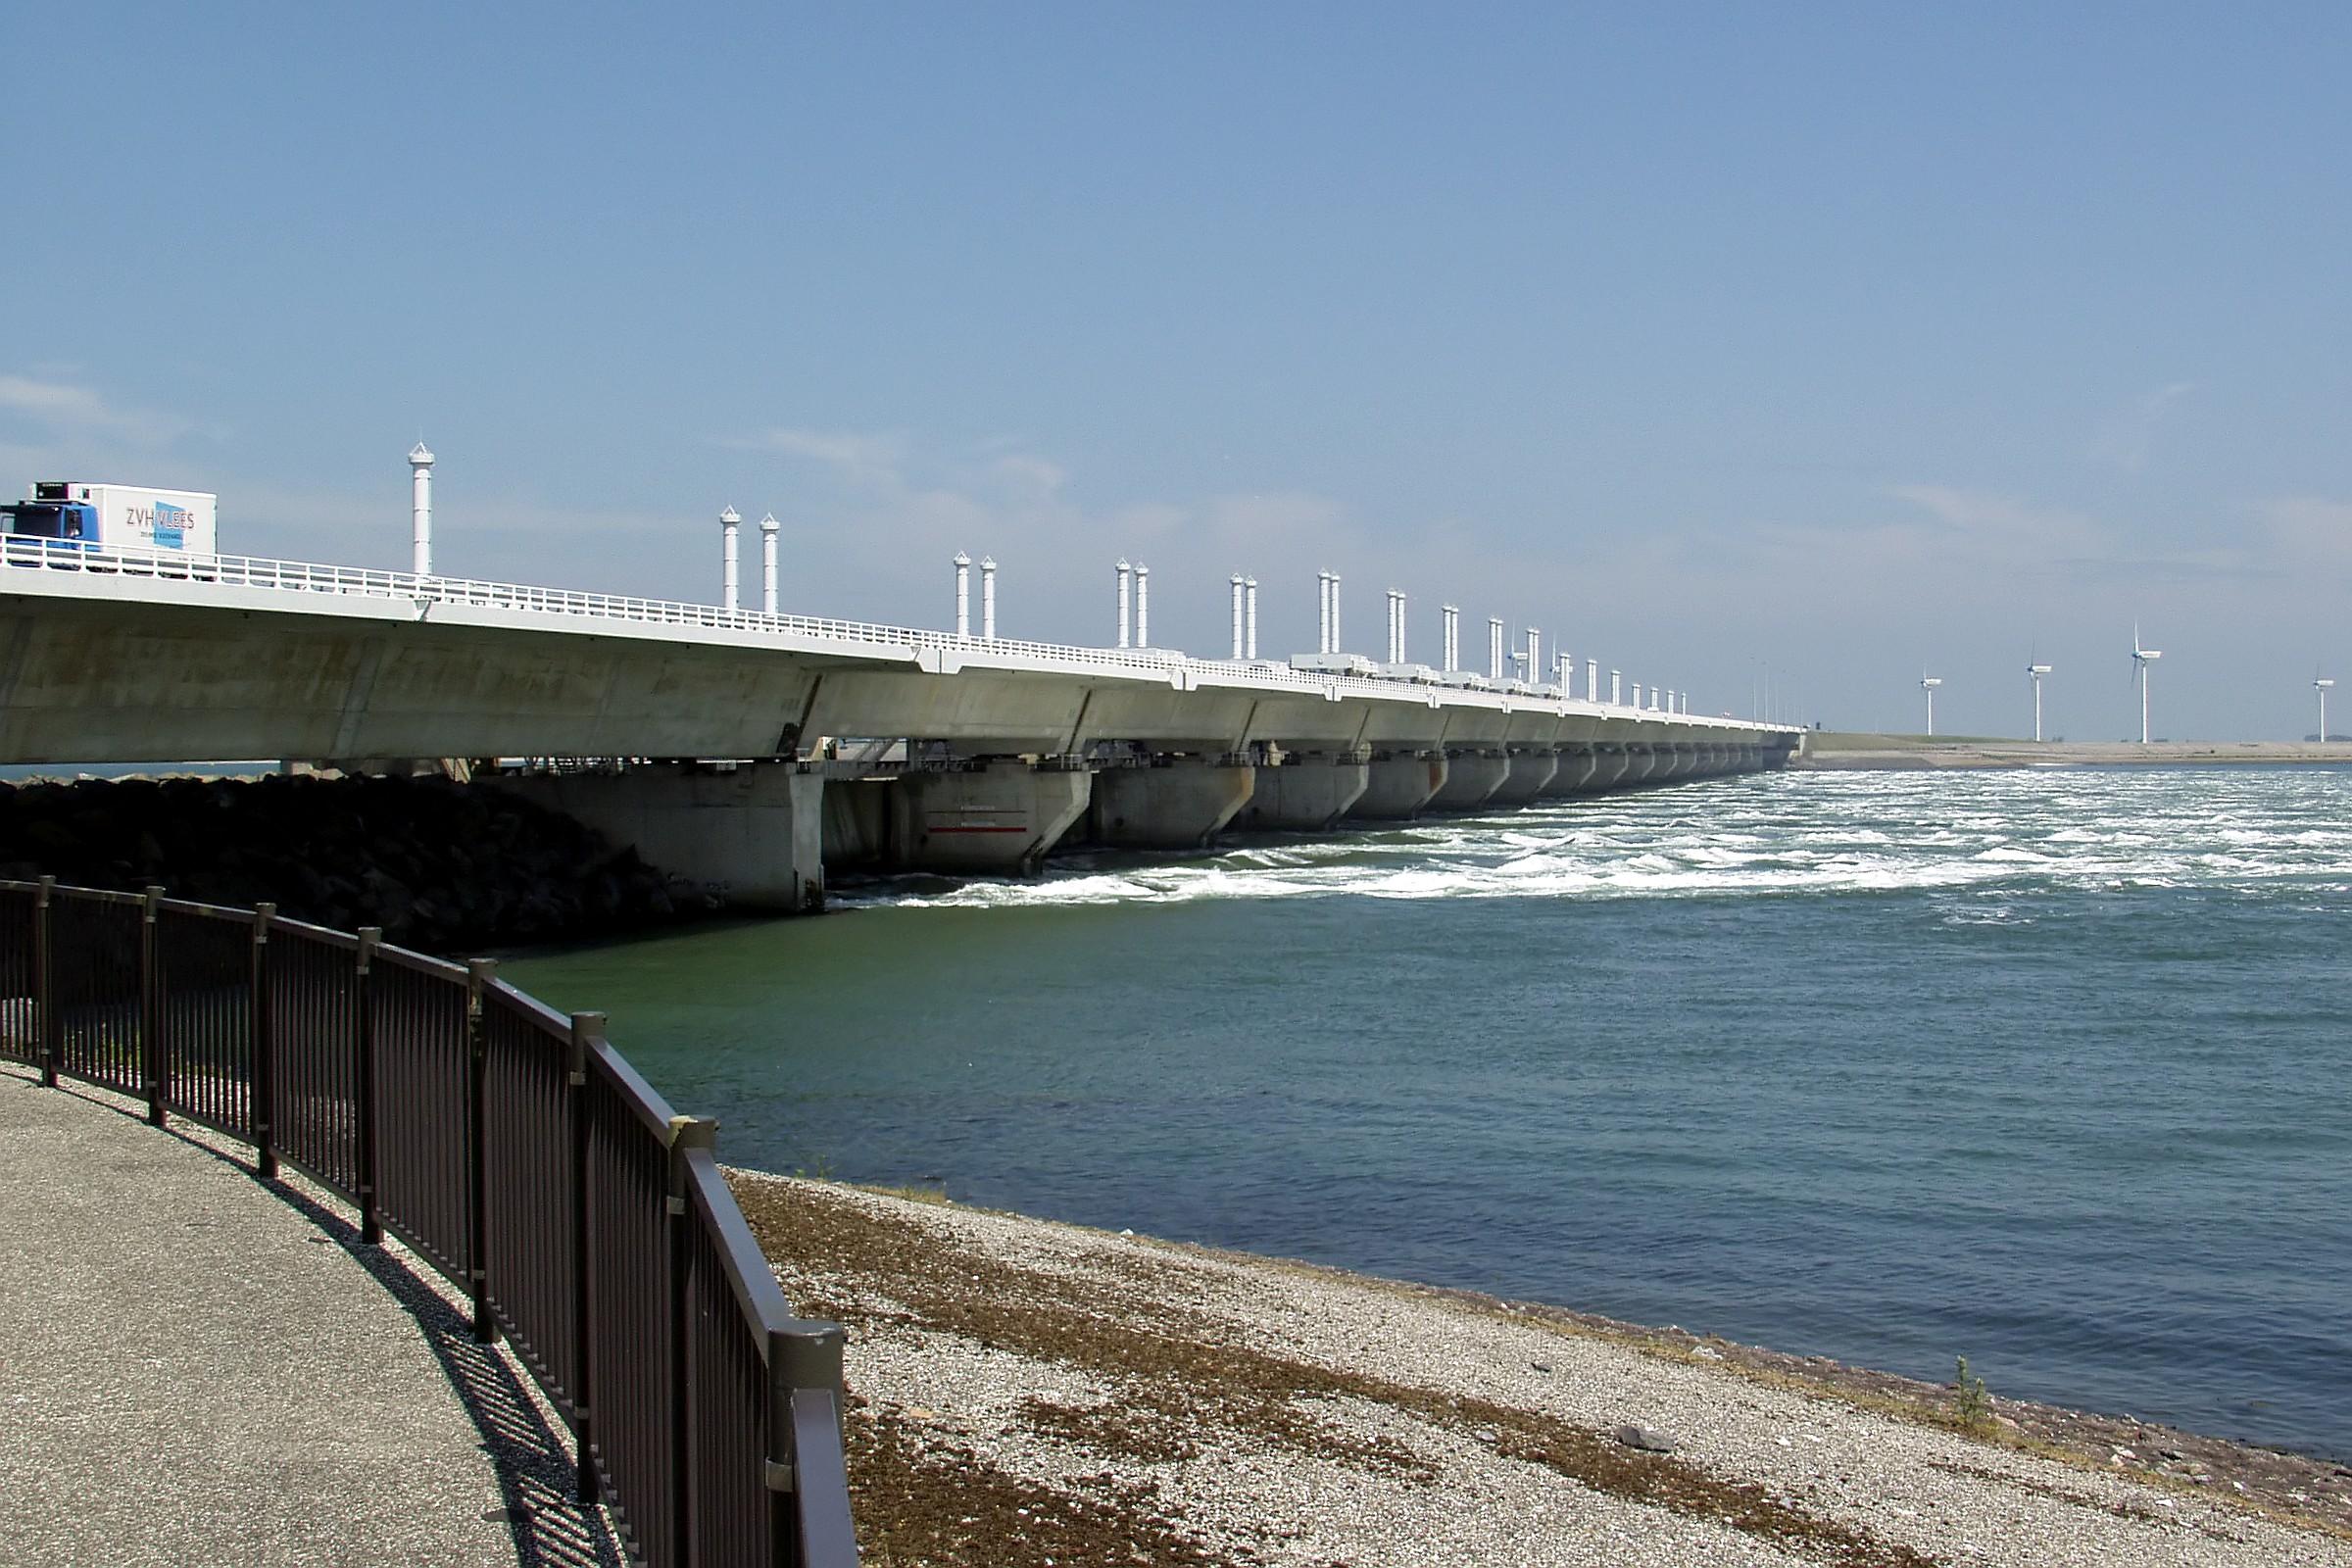 Deltawerke-Oosterschelde-Sturmflutwehr Oosterscheldeseite